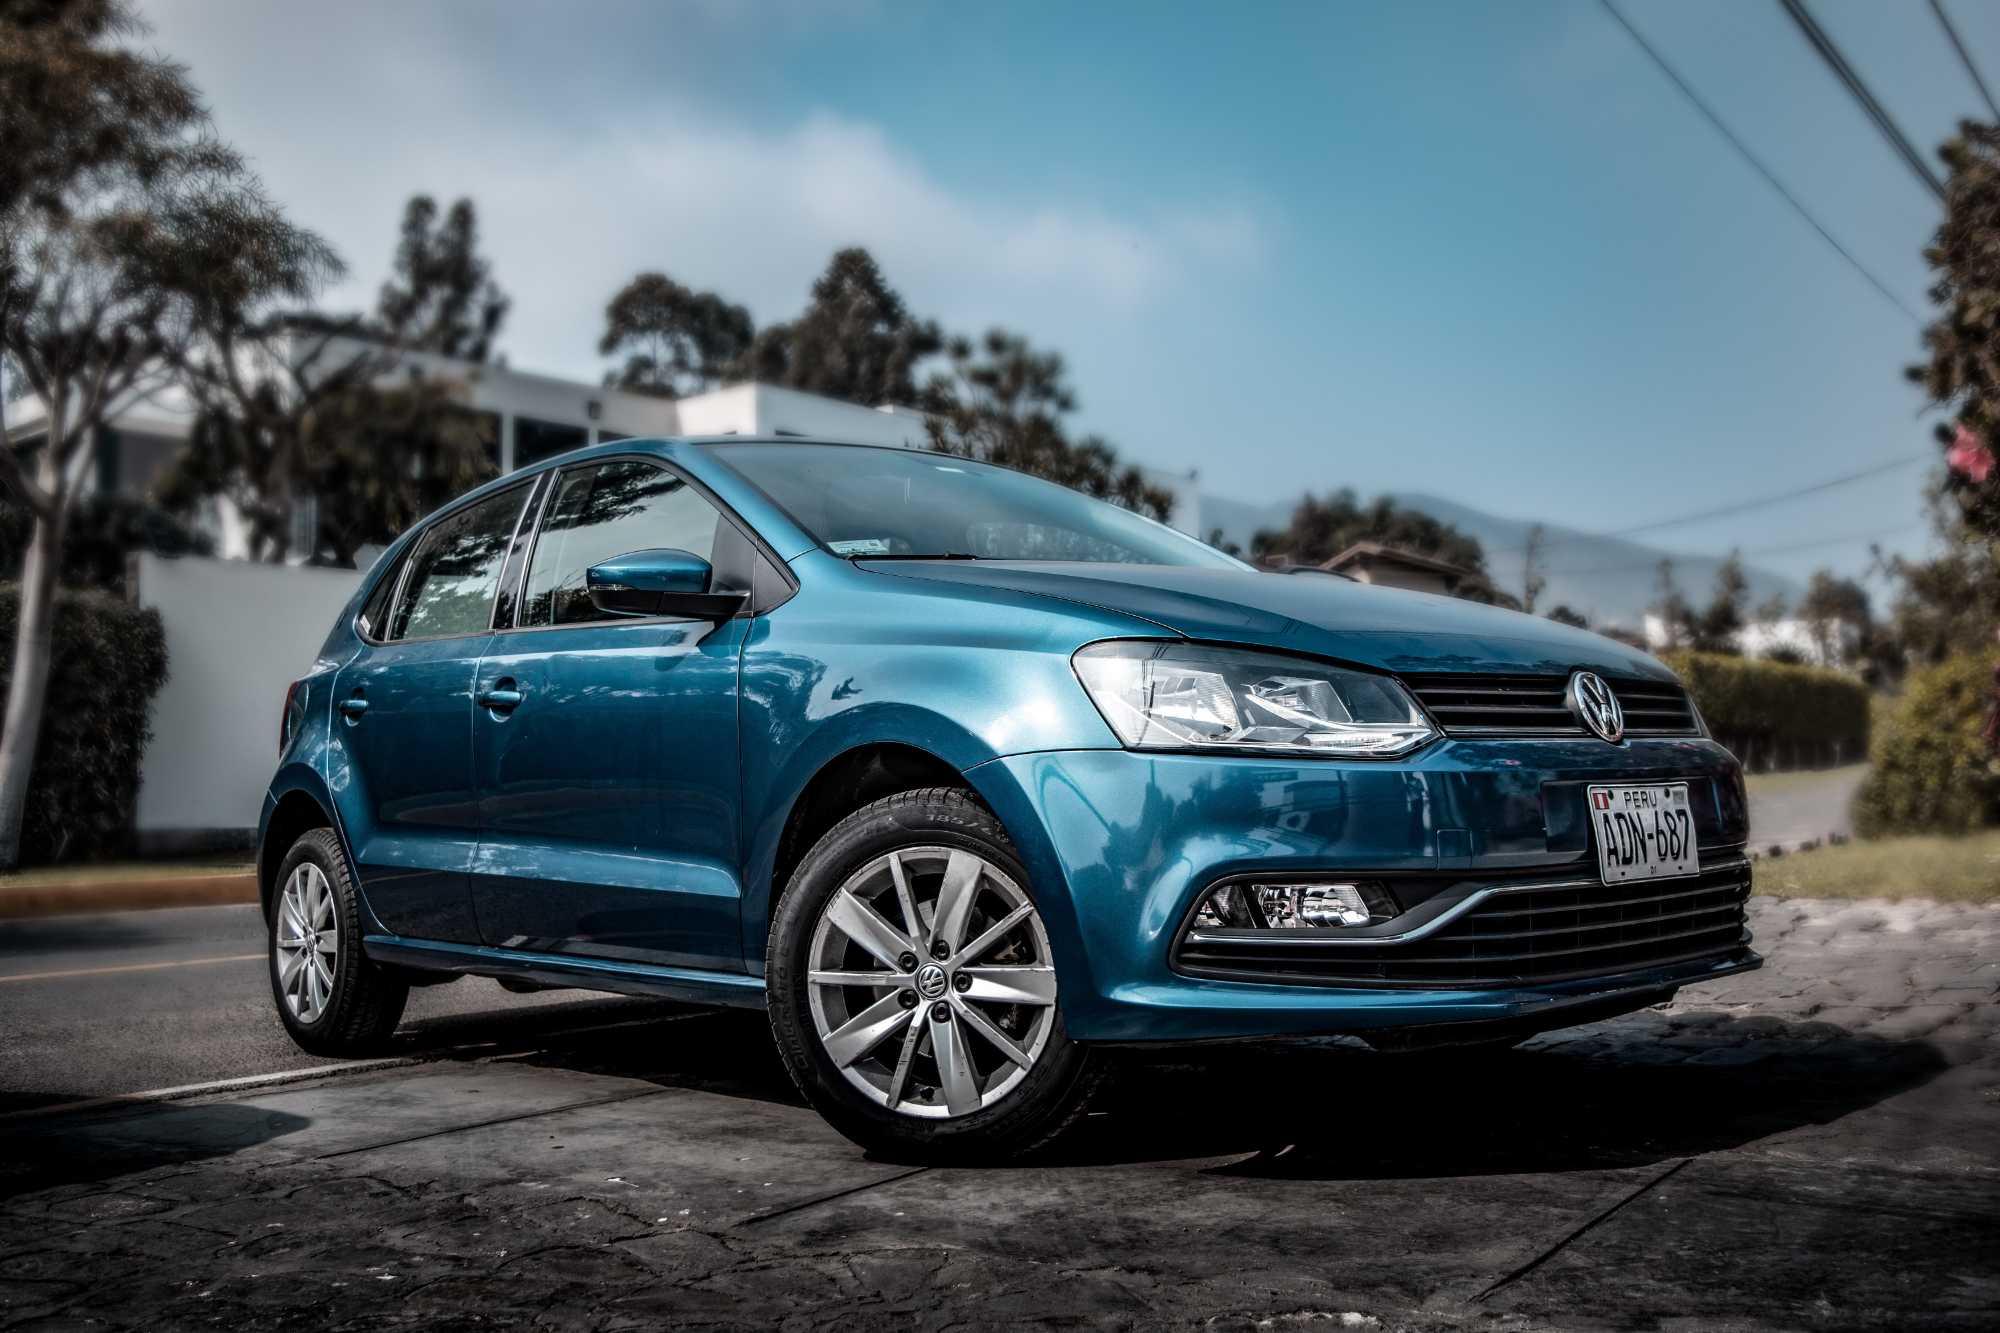 5 dicas de como tirar fotos incríveis dos carros para a venda